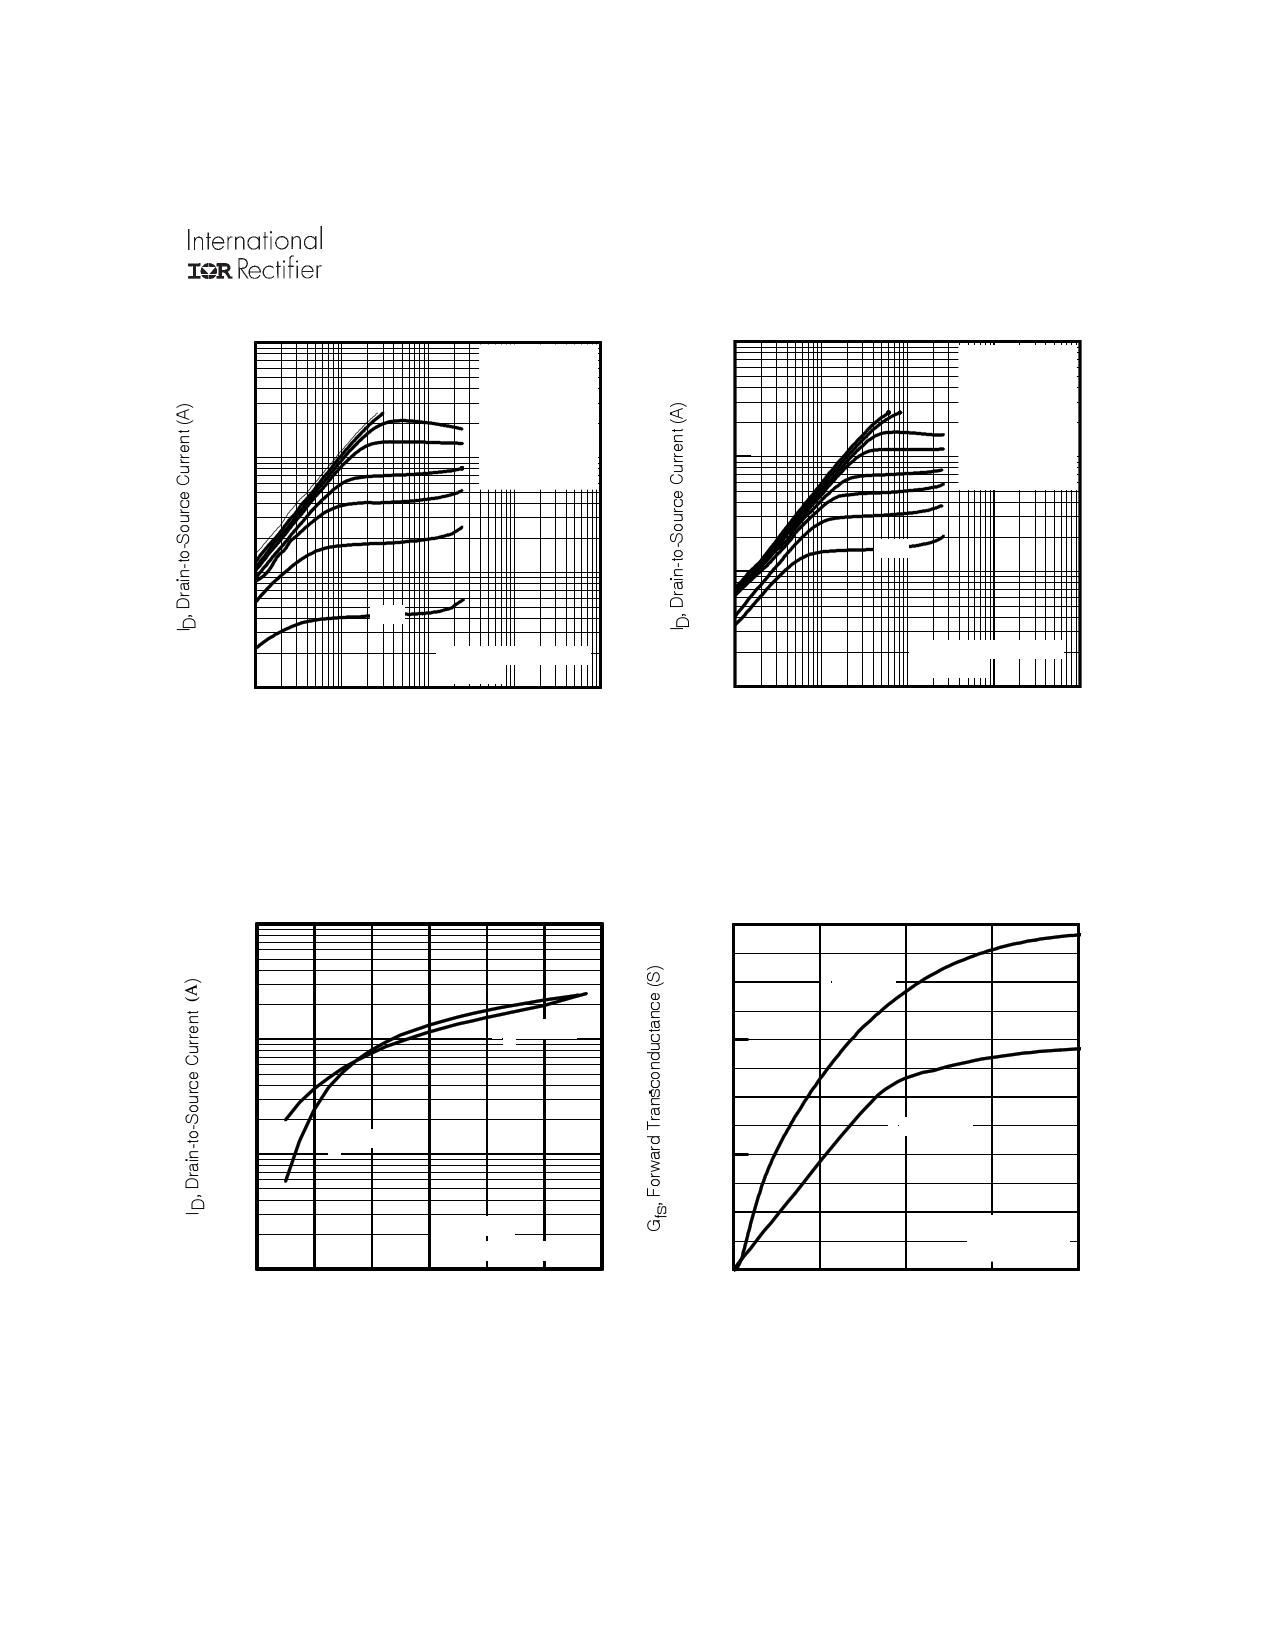 IRFZ48ZPbF pdf, ピン配列